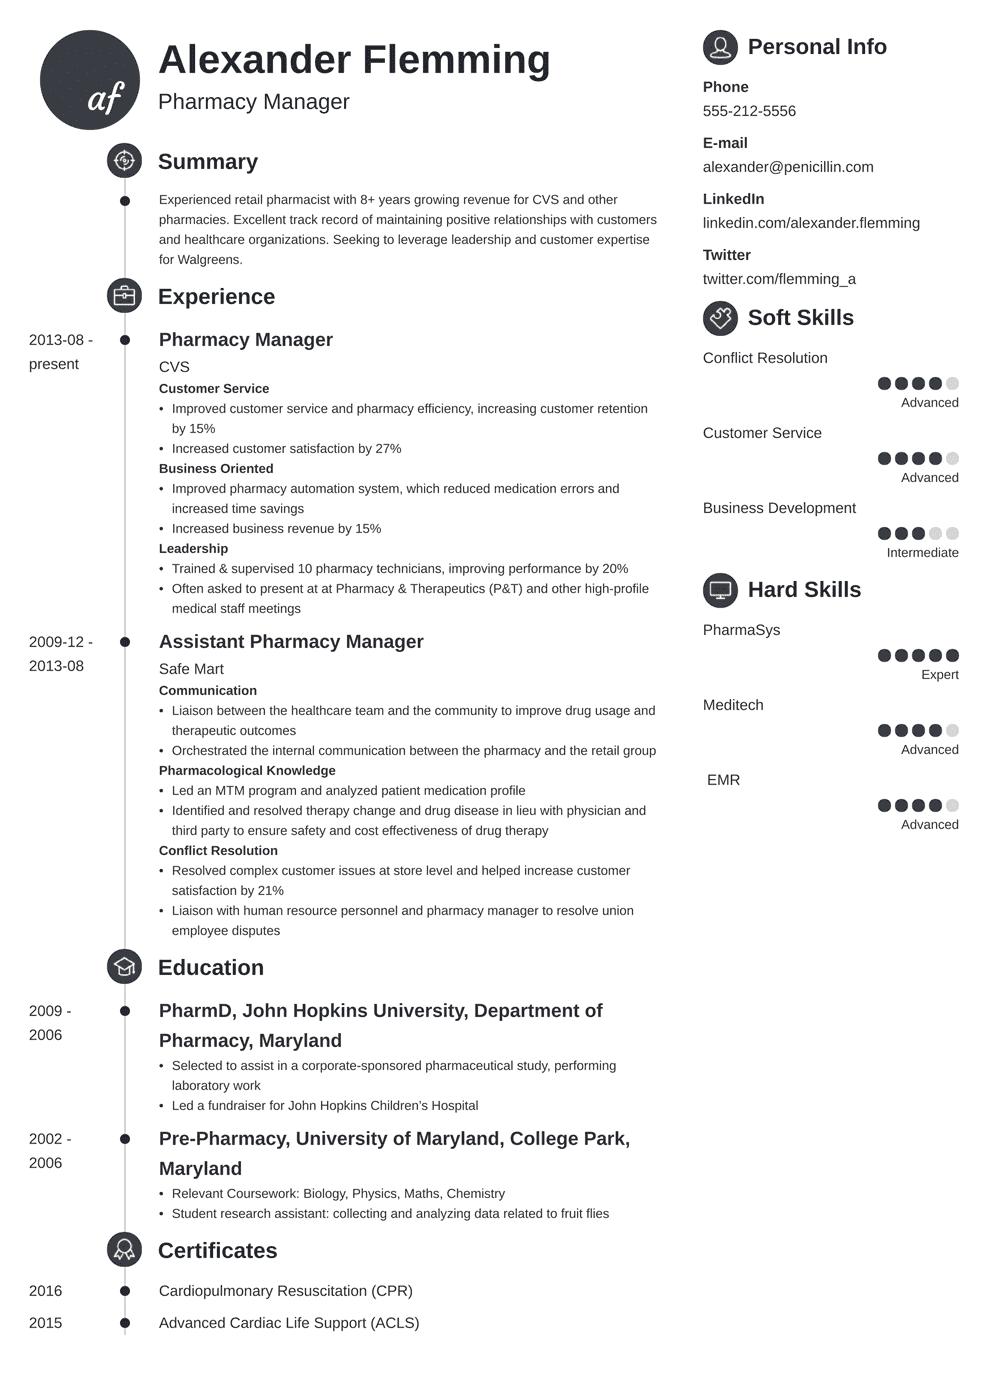 pharmacist resume template primo in 2020 Resume template